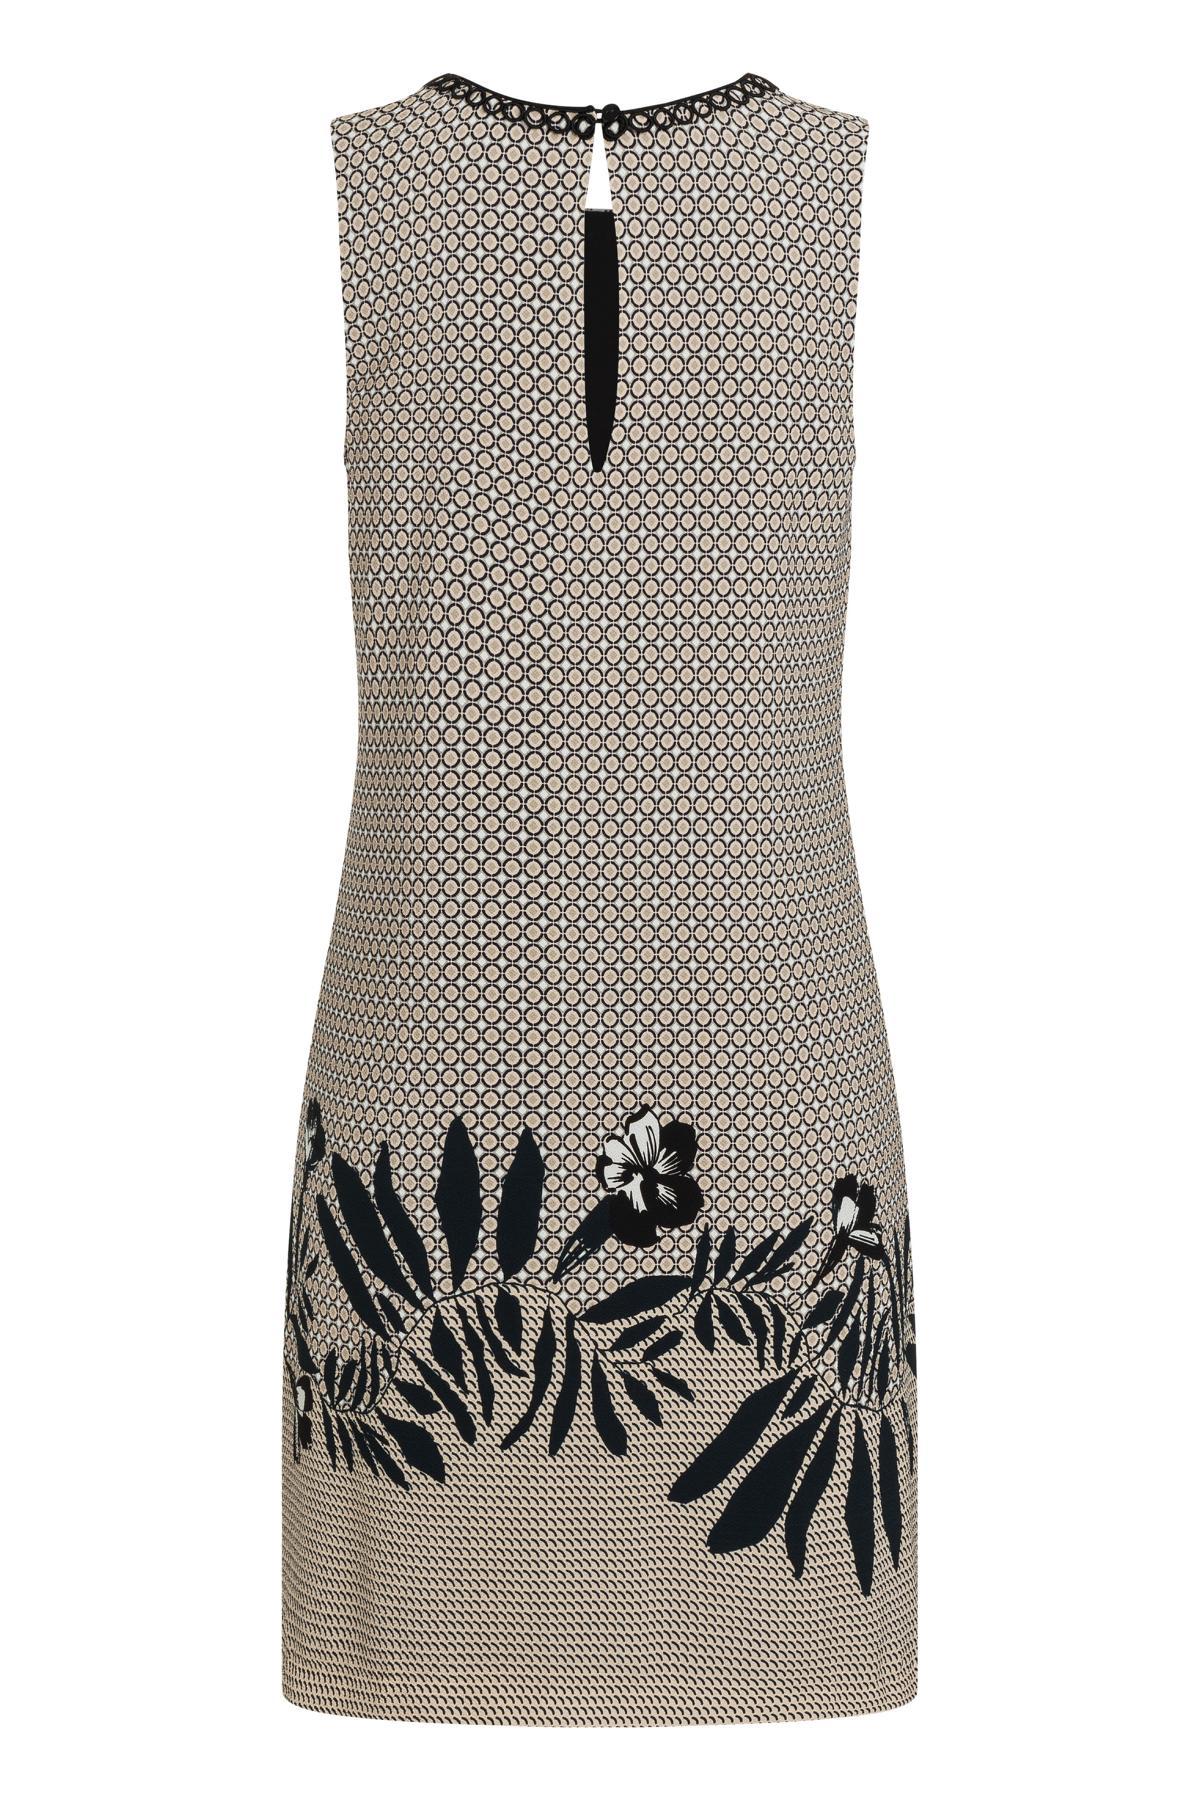 Detailed view 2 of Ana Alcazar Sleeveless Dress Sedoni